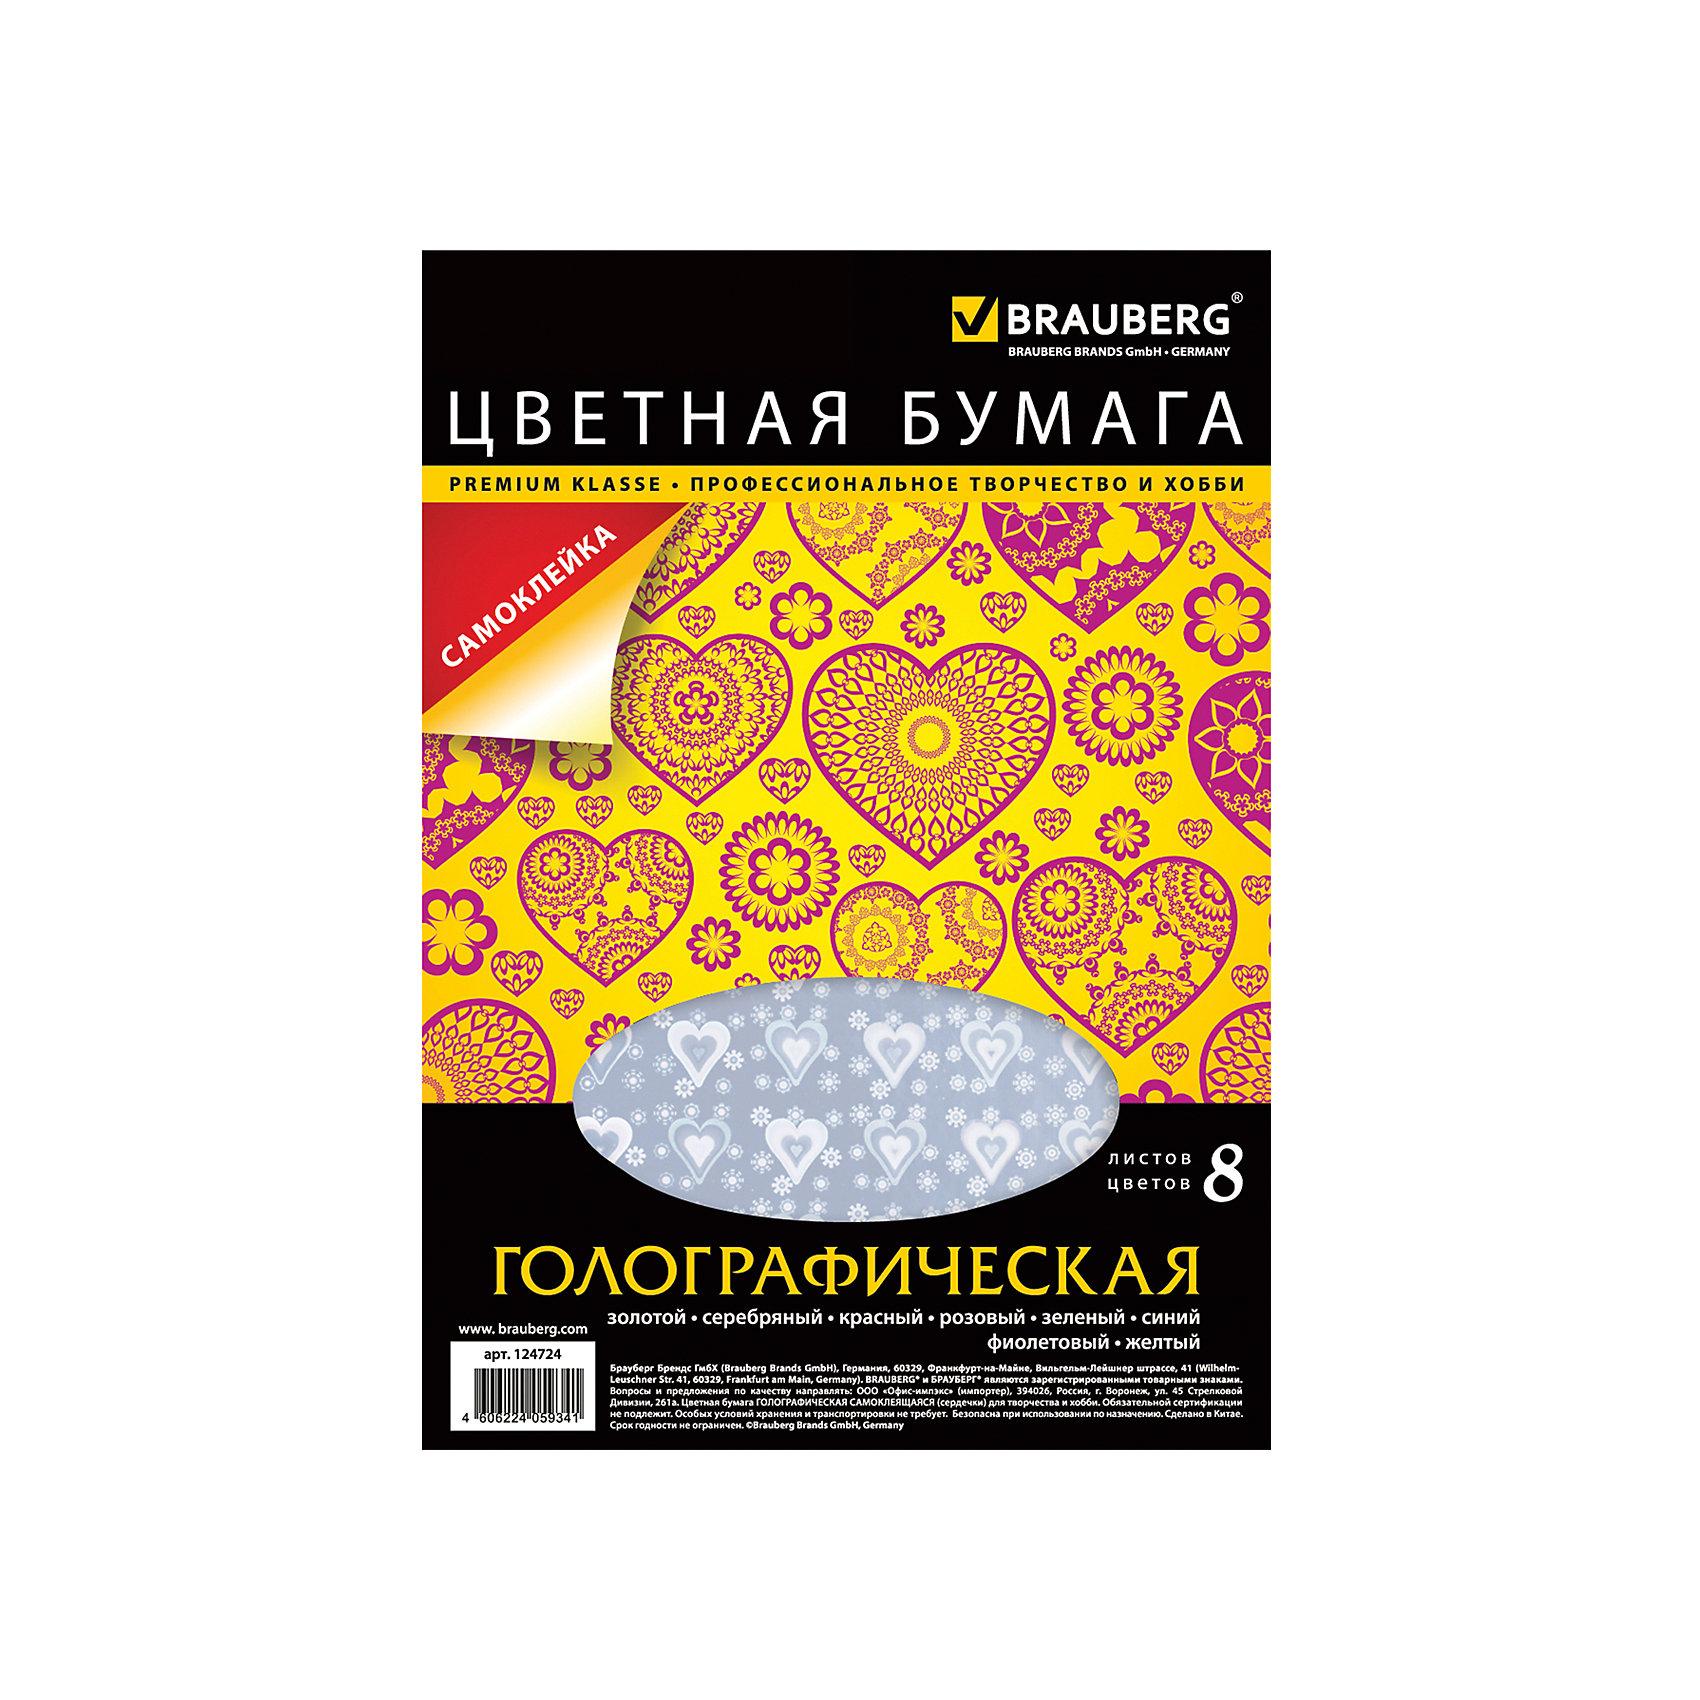 Brauberg Самоклеящаяся цветная бумага А4, 8 л., 8 цв., бумага цветная 10 листов 10 цветов двухсторонняя shopkins